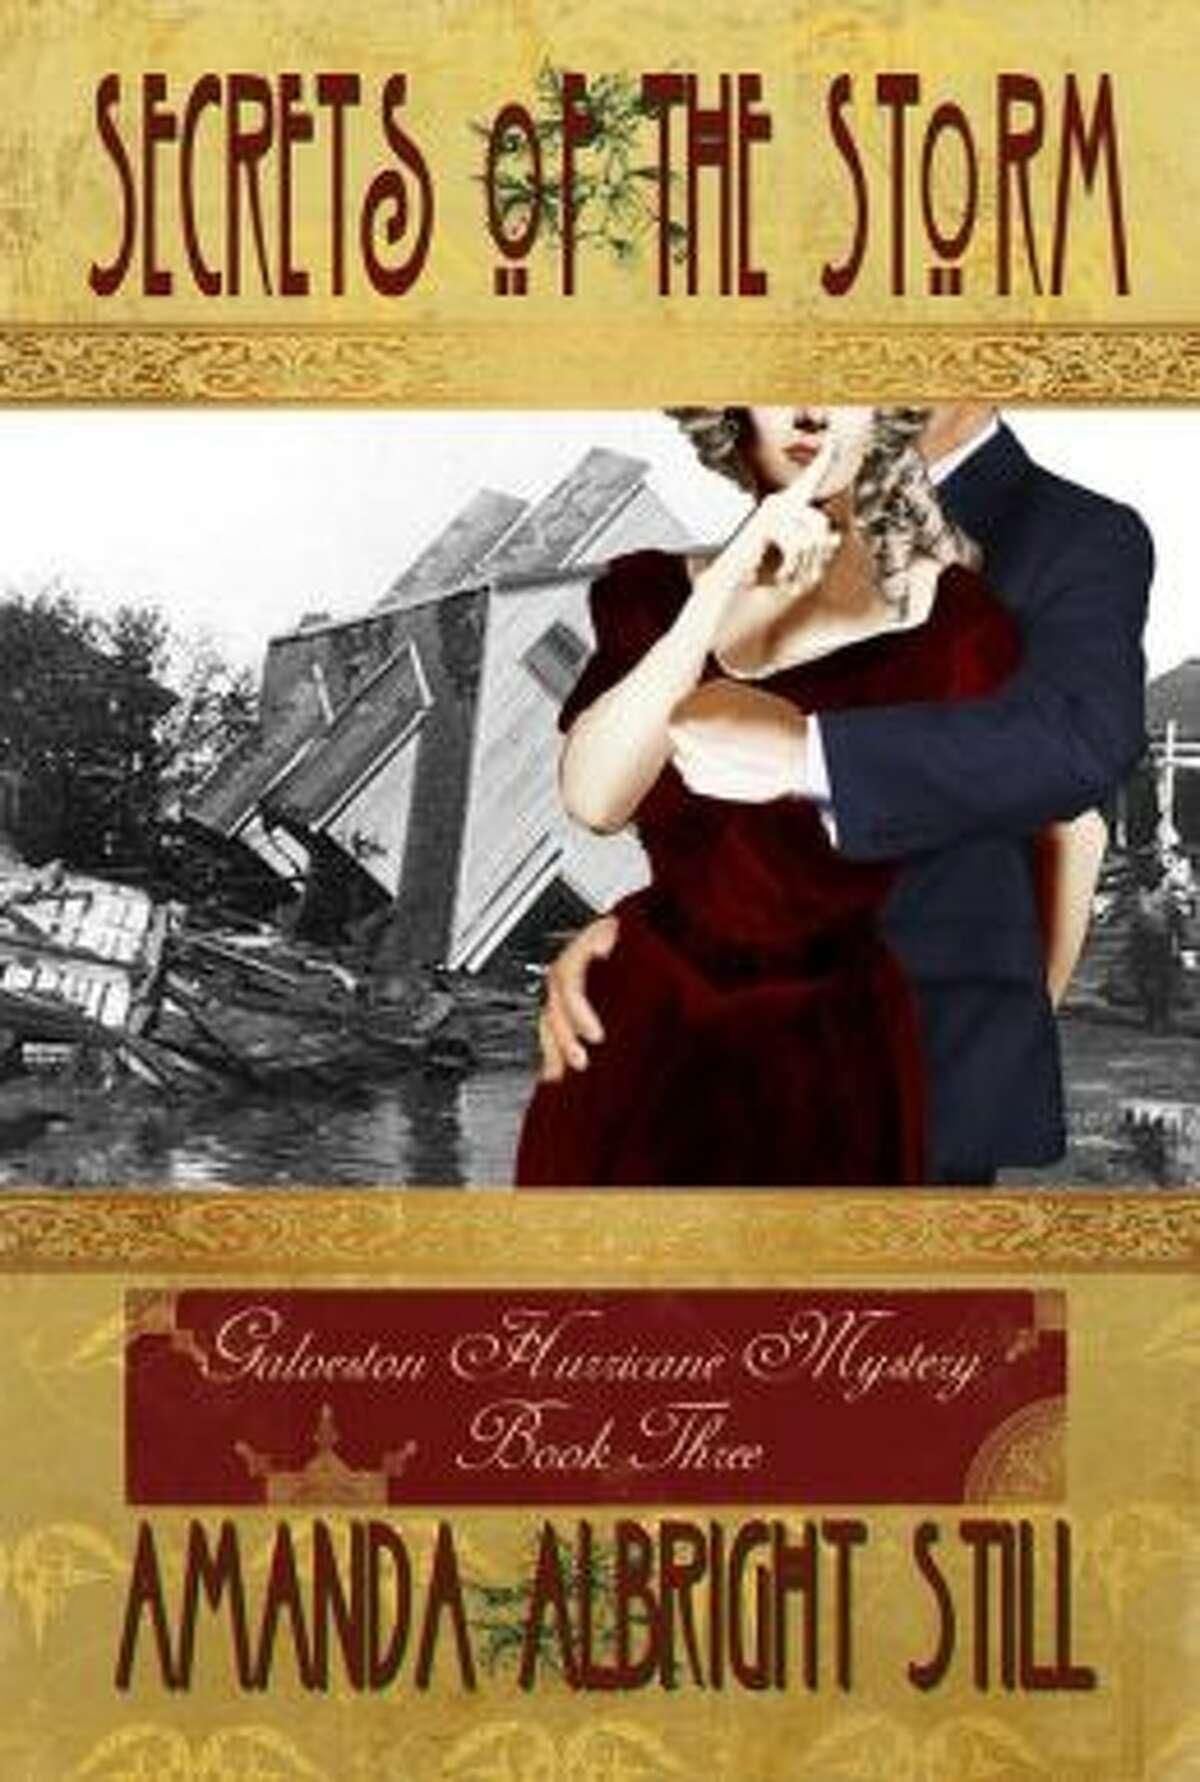 """Secrets of the Storm"" by Amanda Albright Still"